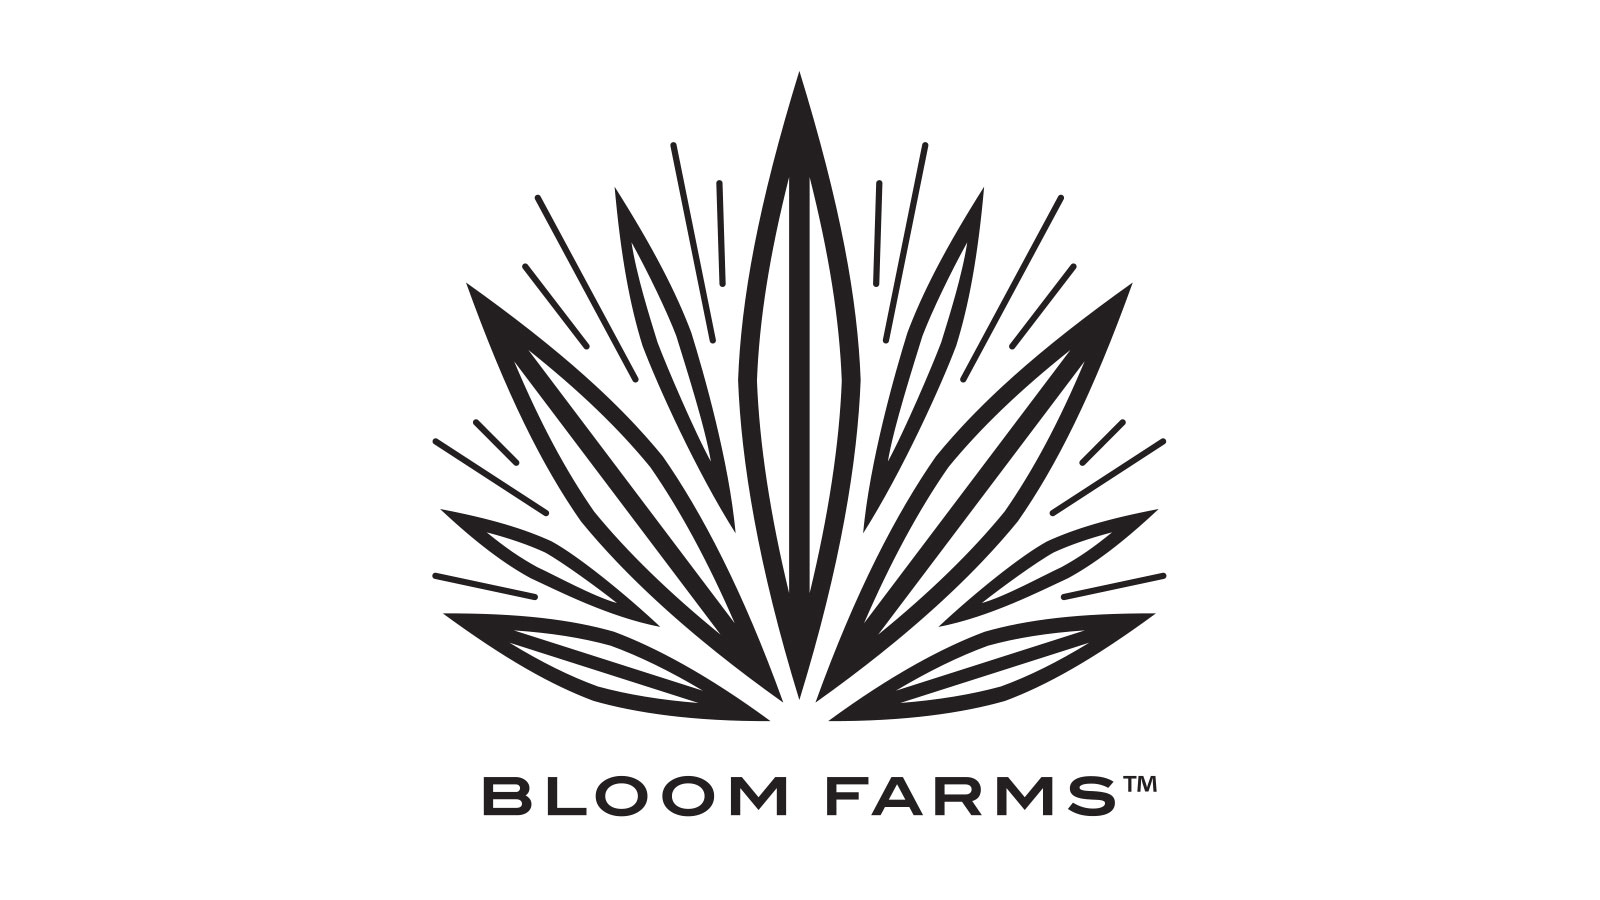 Bloom Farms